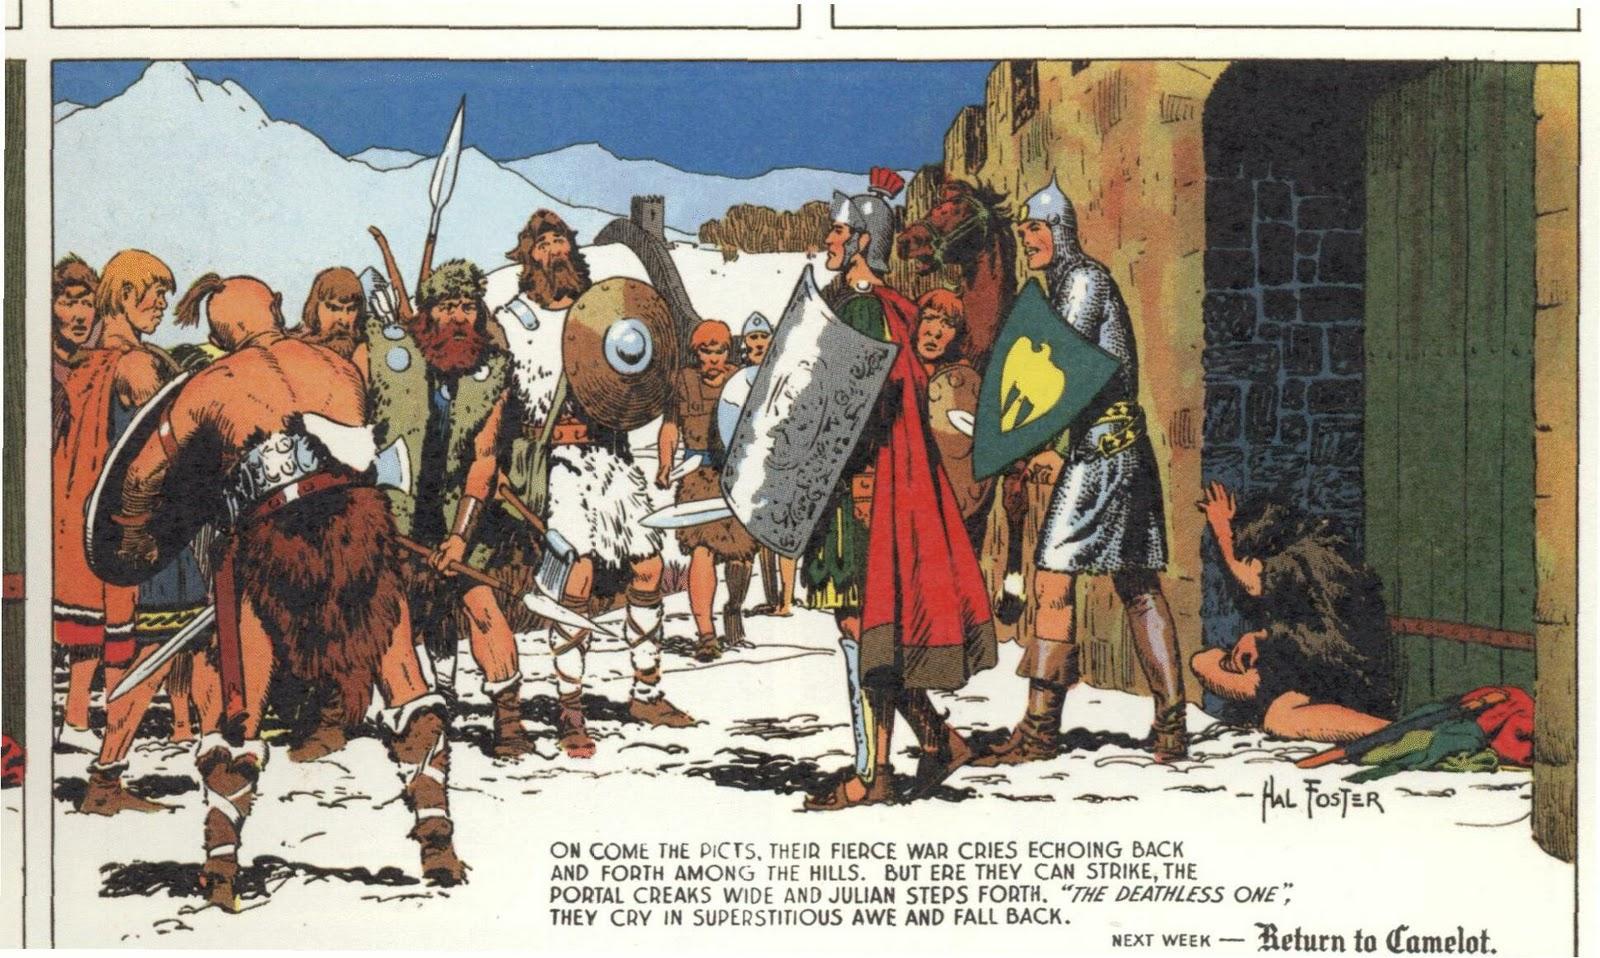 Prince Valiant Sir Gawain Friend